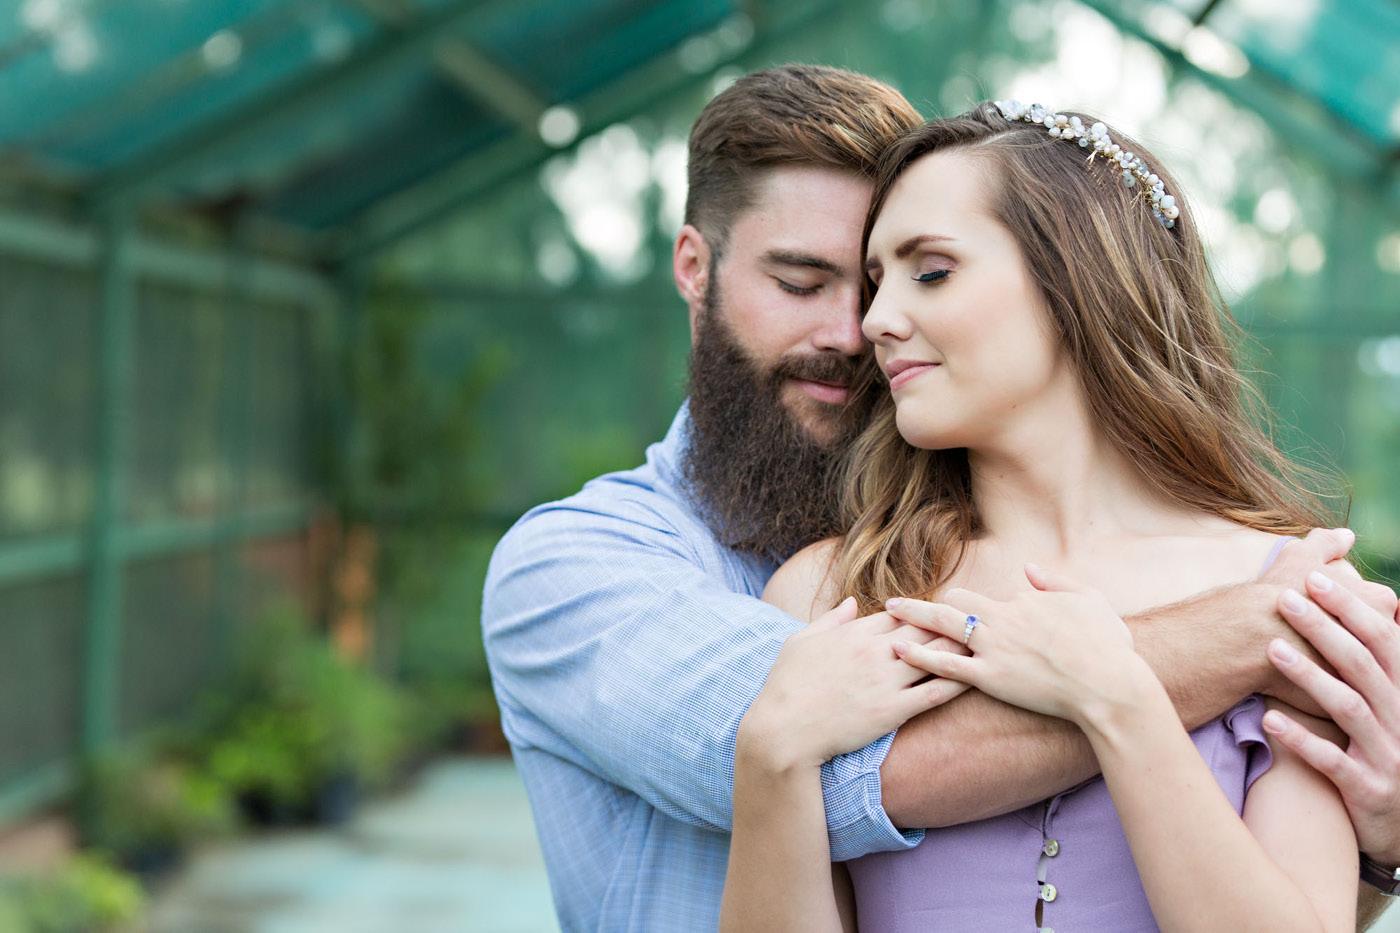 Chanelle & Cobus | Engagement shoot